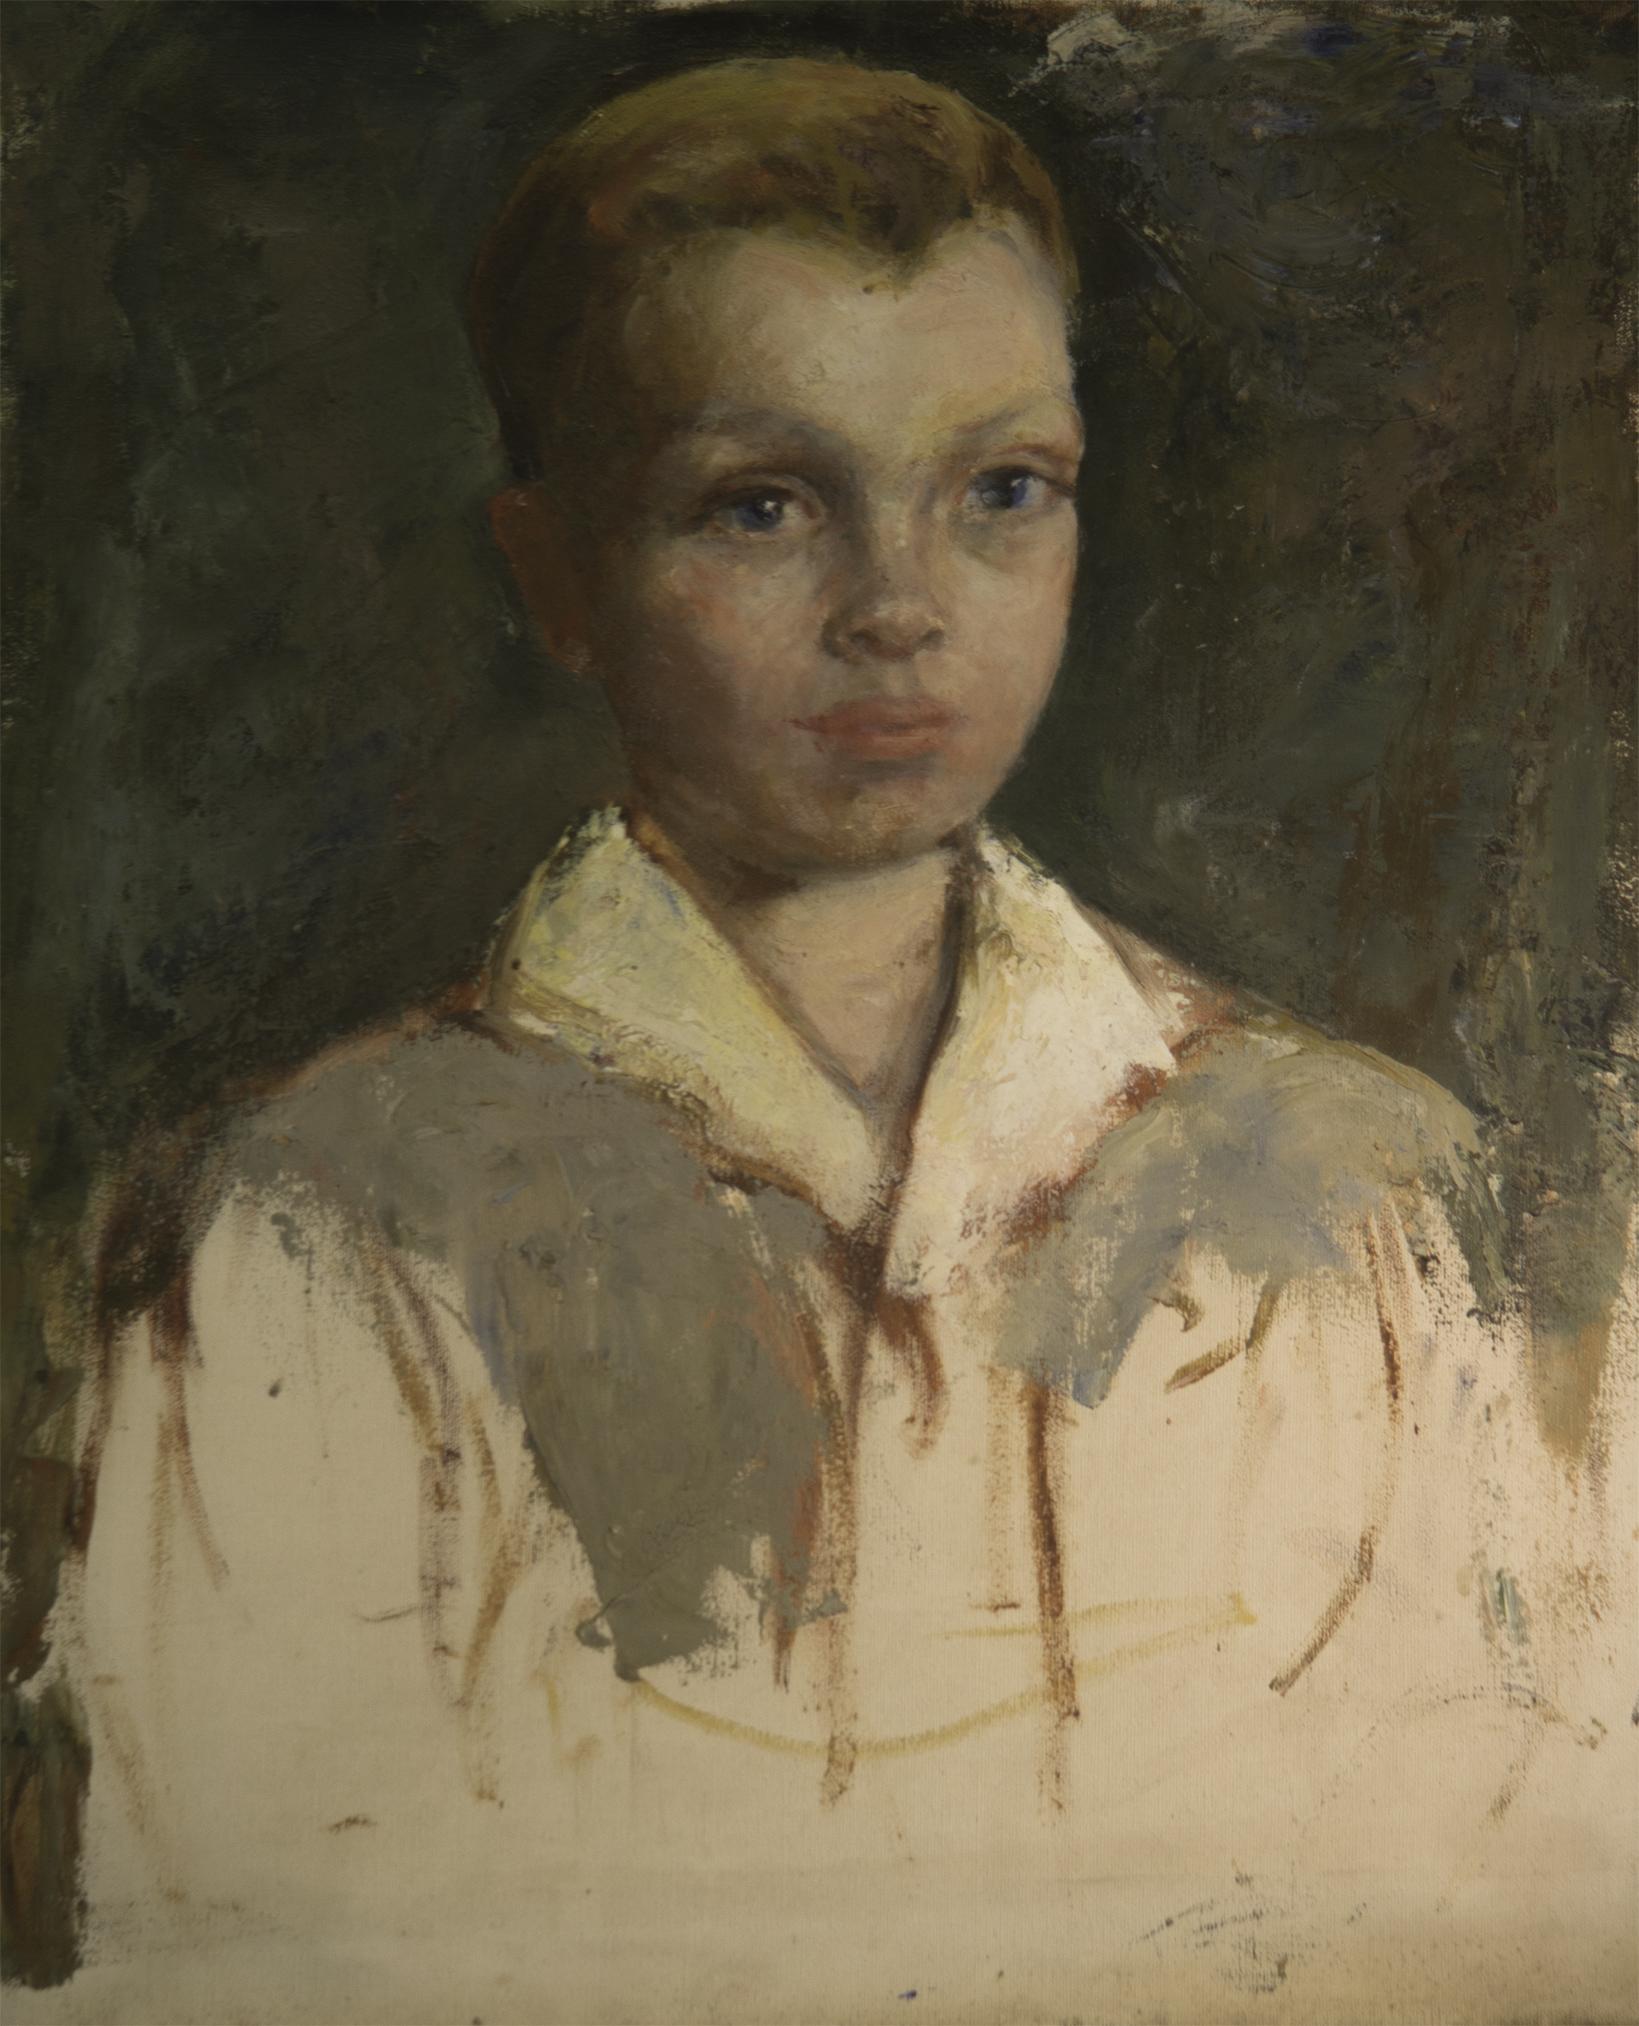 Winfield Kurt Greene, aged 10 in 1929.